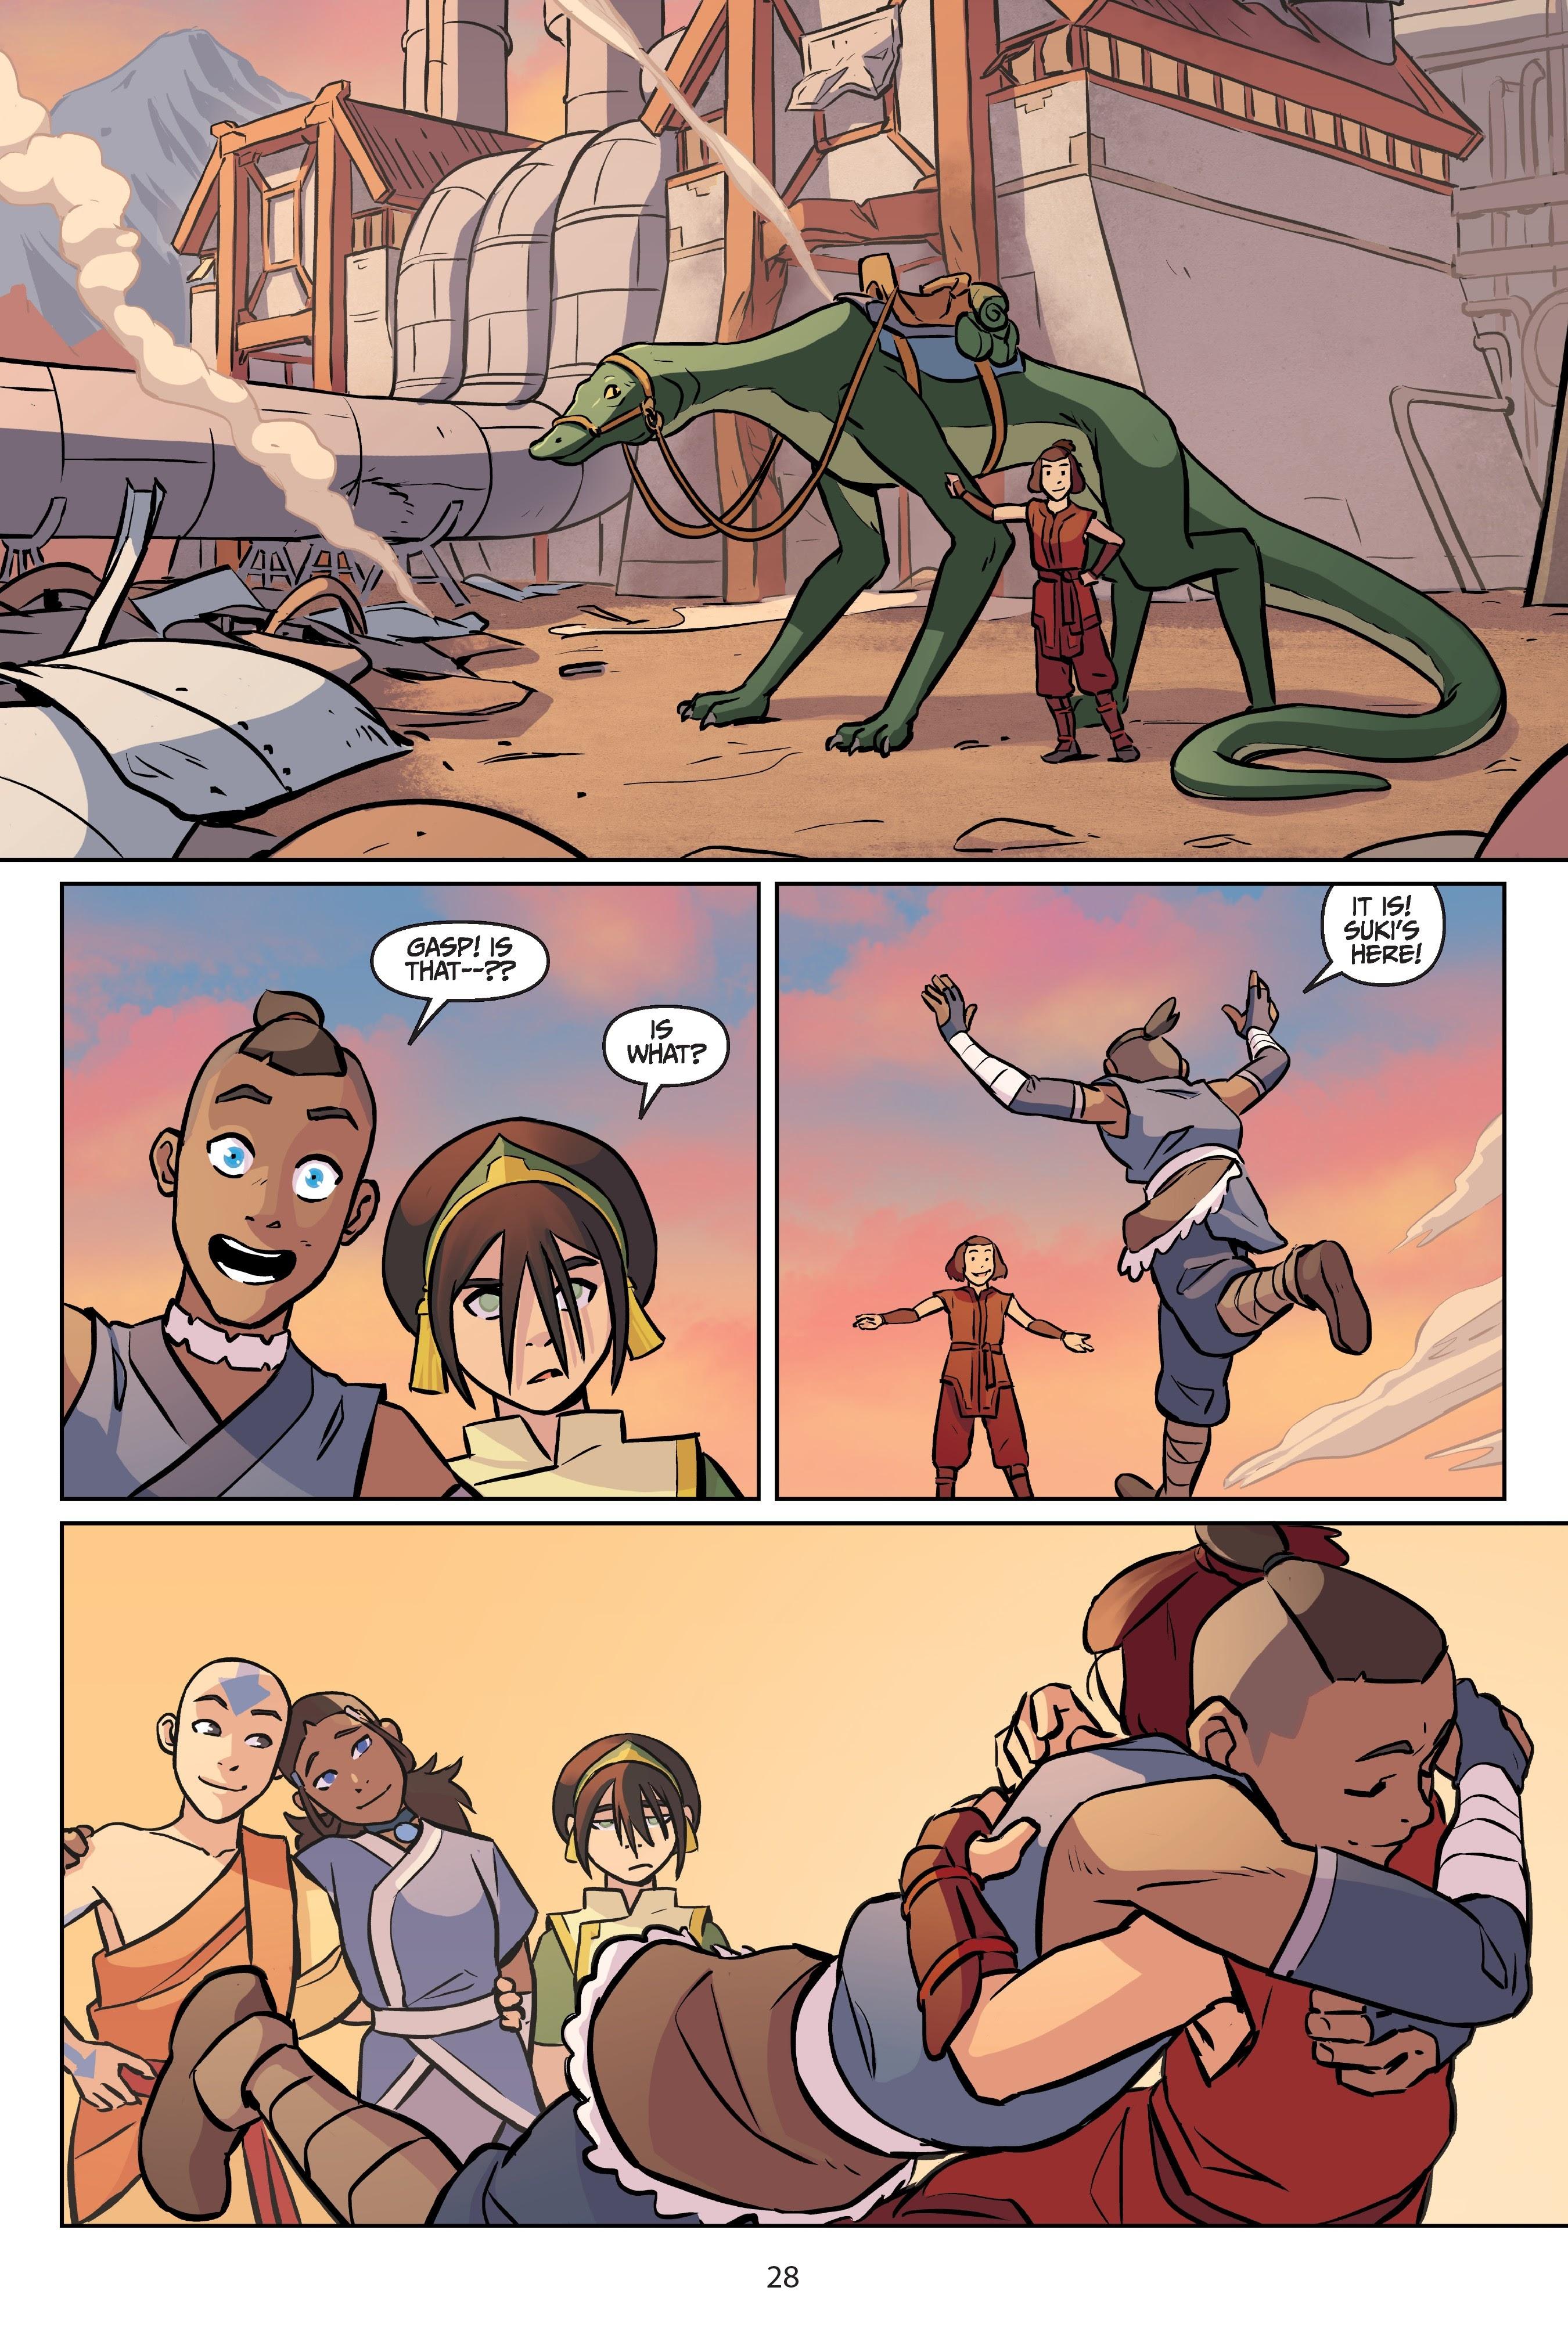 Nickelodeon Avatar: The Last Airbender - Imbalance TPB_2 Page 28